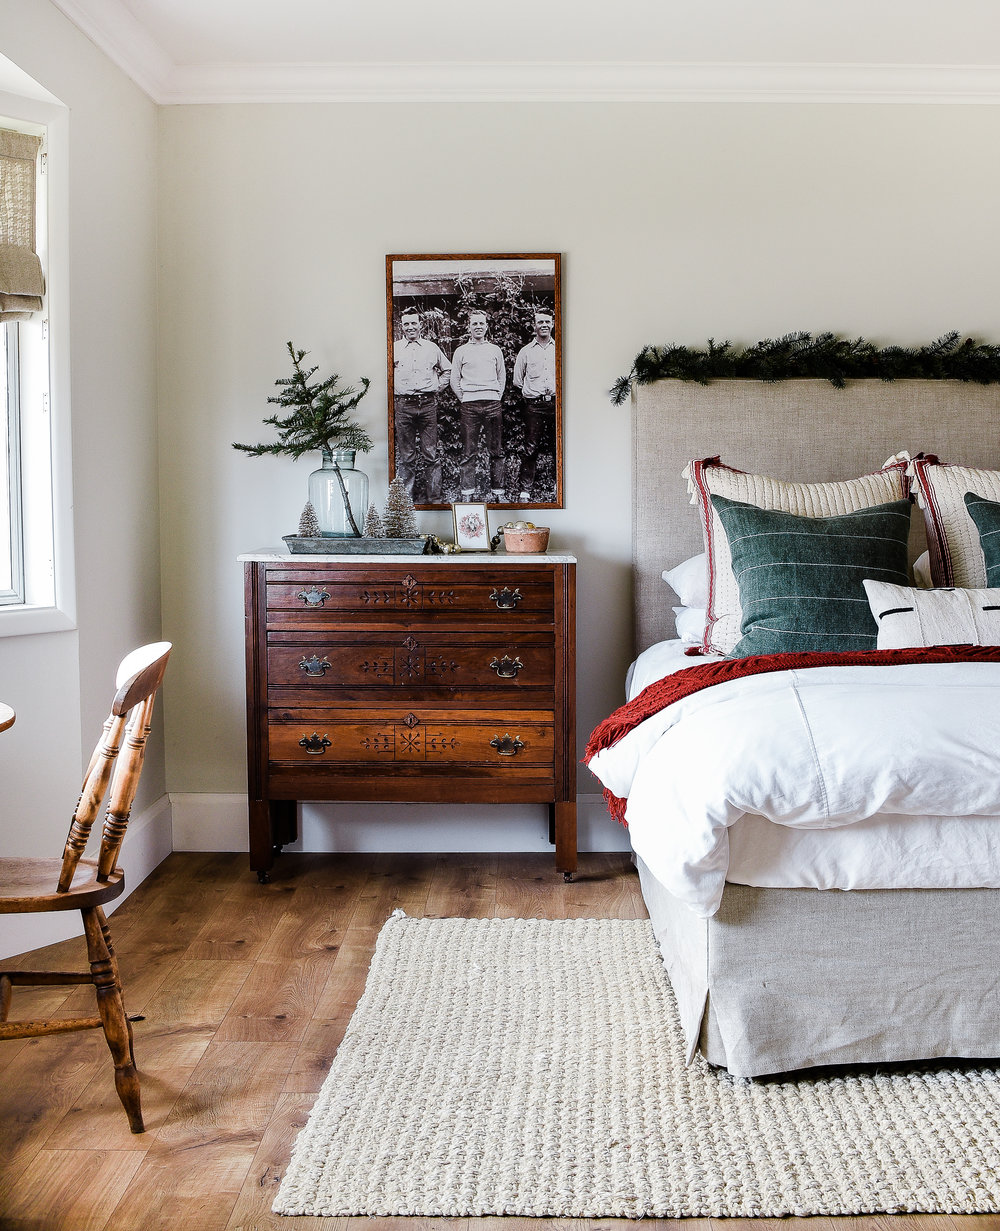 Christmas bedroom ideas from boxwoodavenue.com